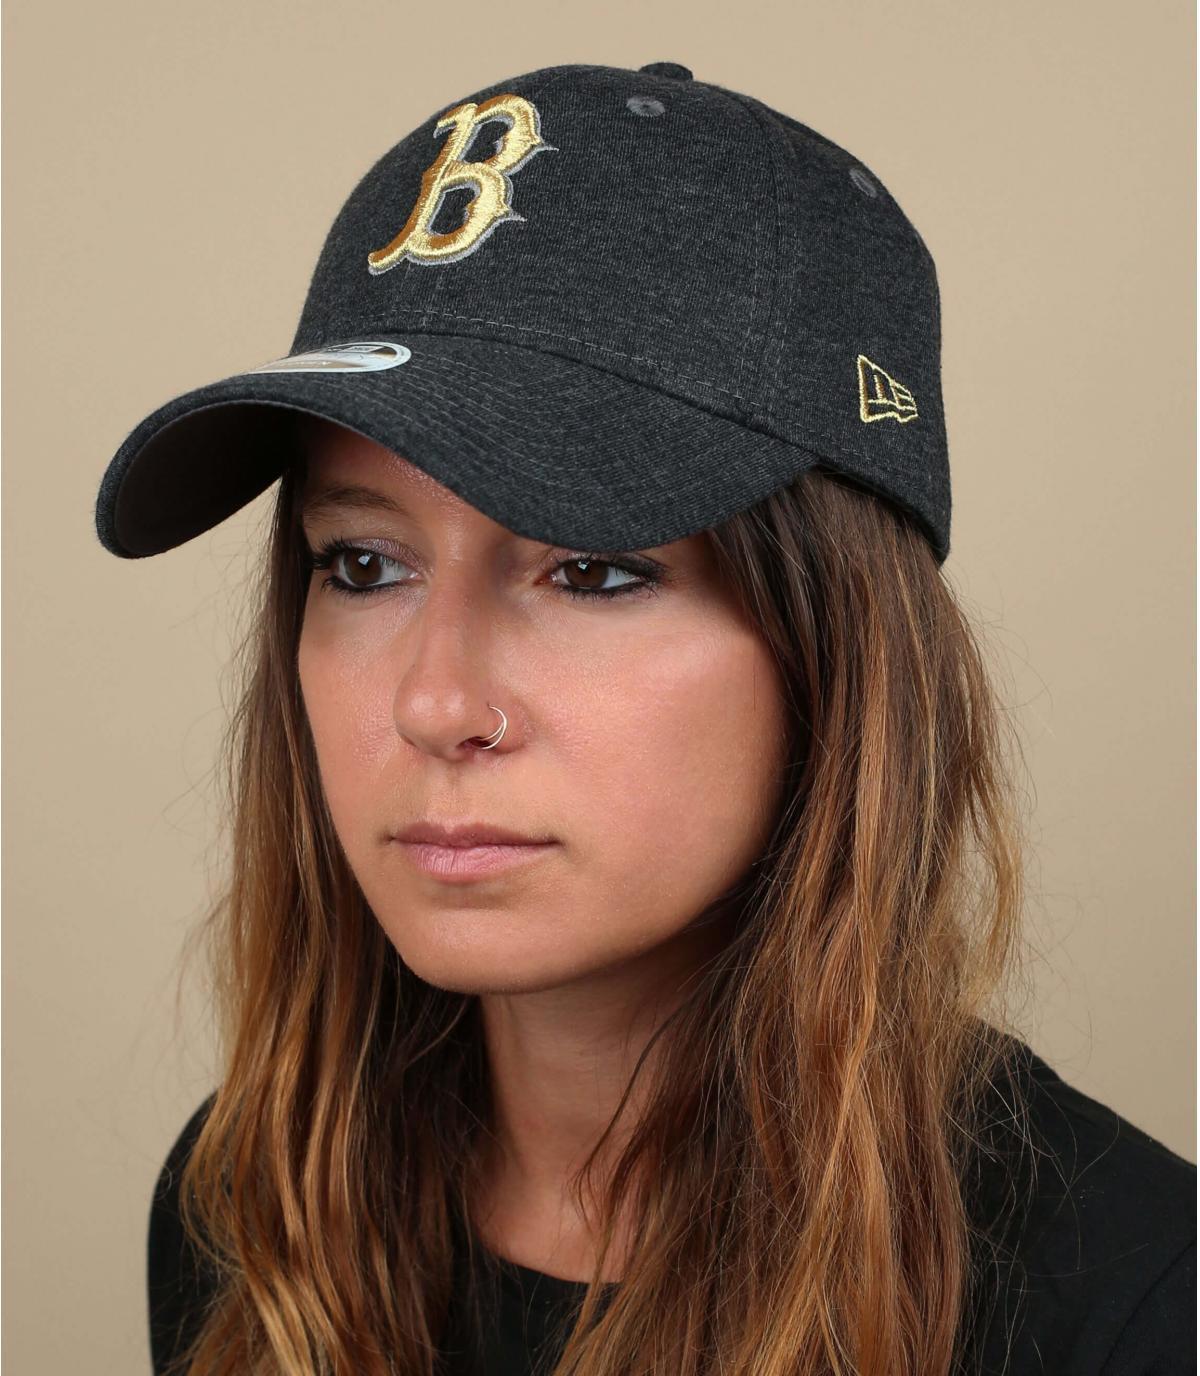 gorra mujer B gris oro